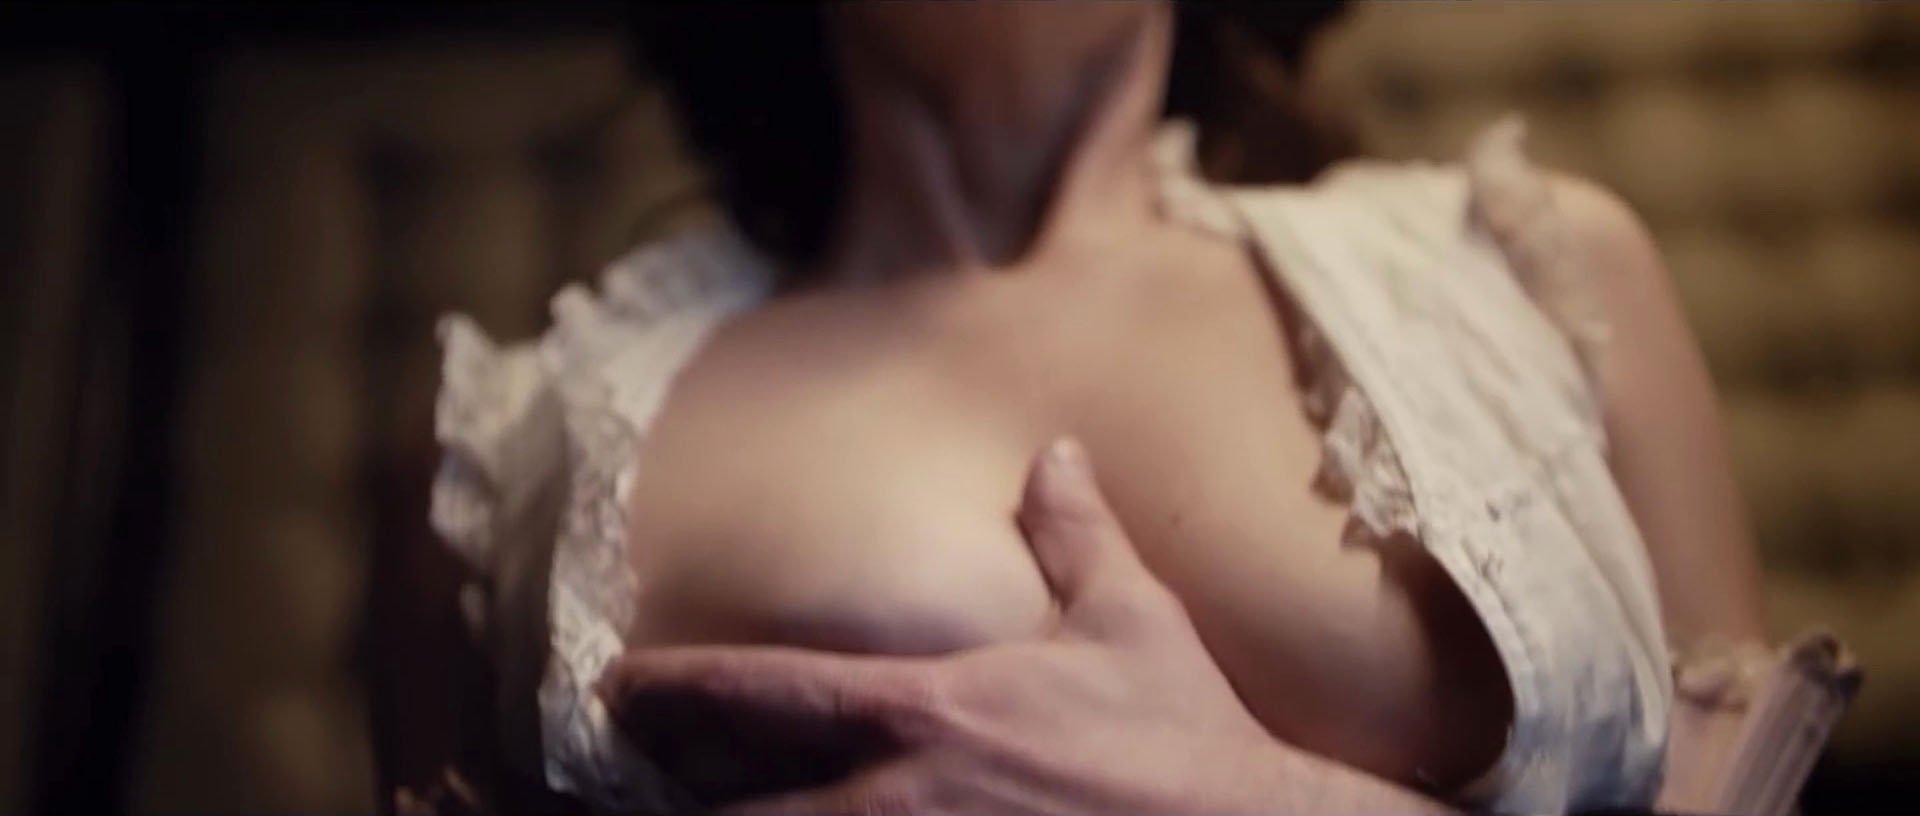 Olga Sutulova nude - Trotsky s01e02 (2017) uncut